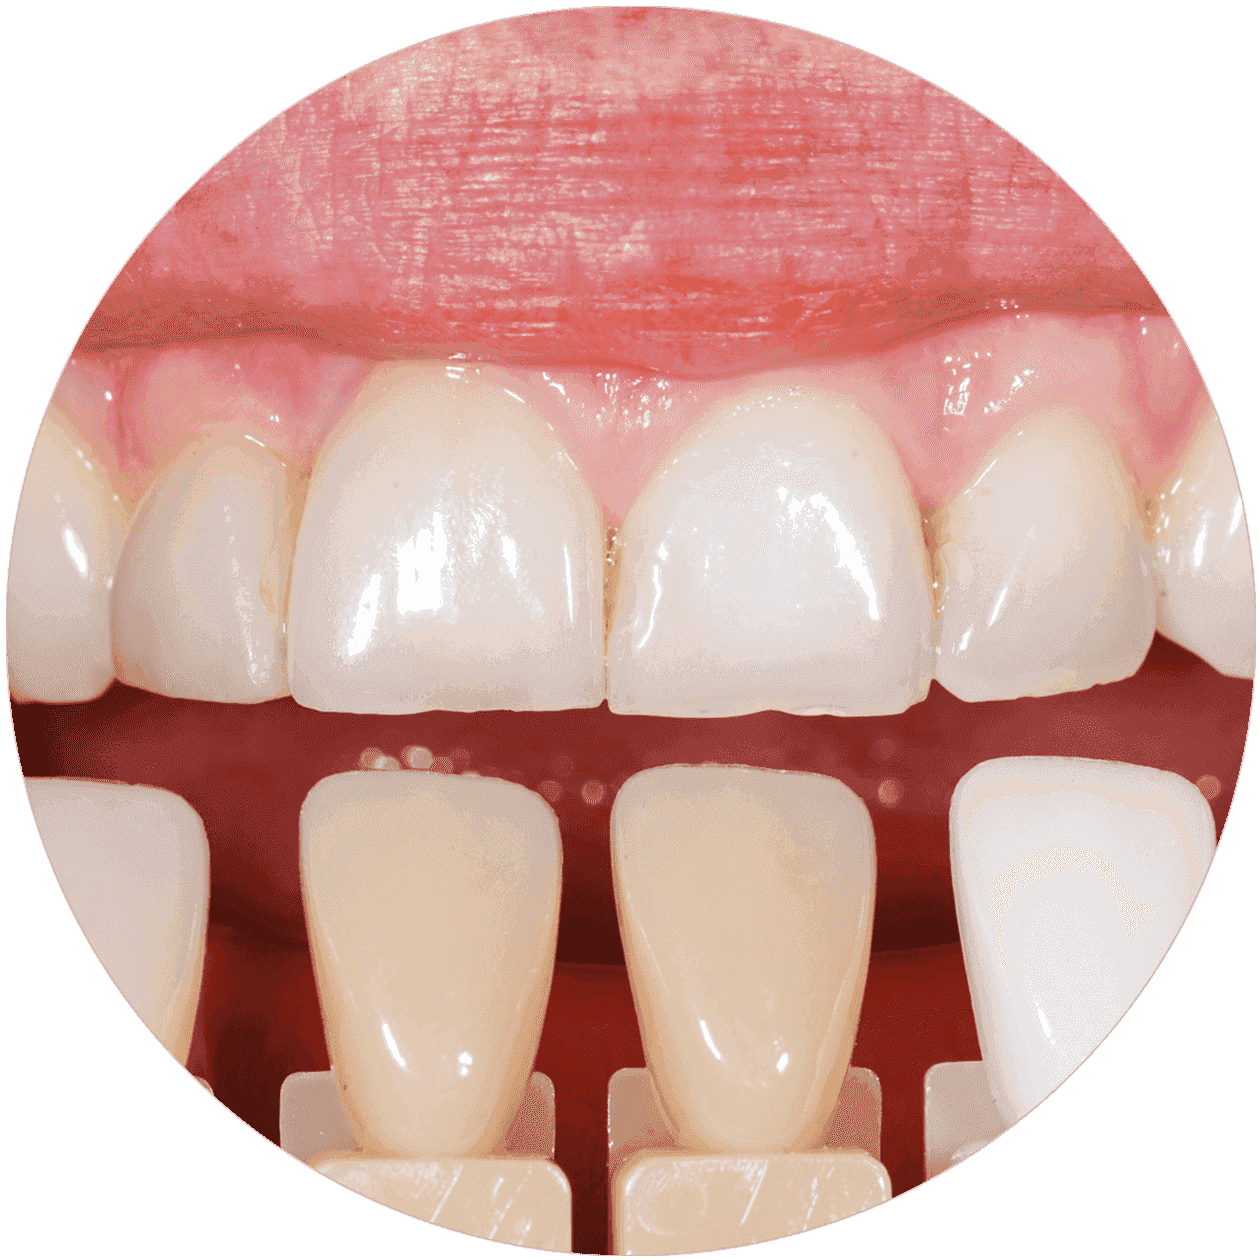 Dr. Vera Leisentritt - Zahnerhaltung - Material